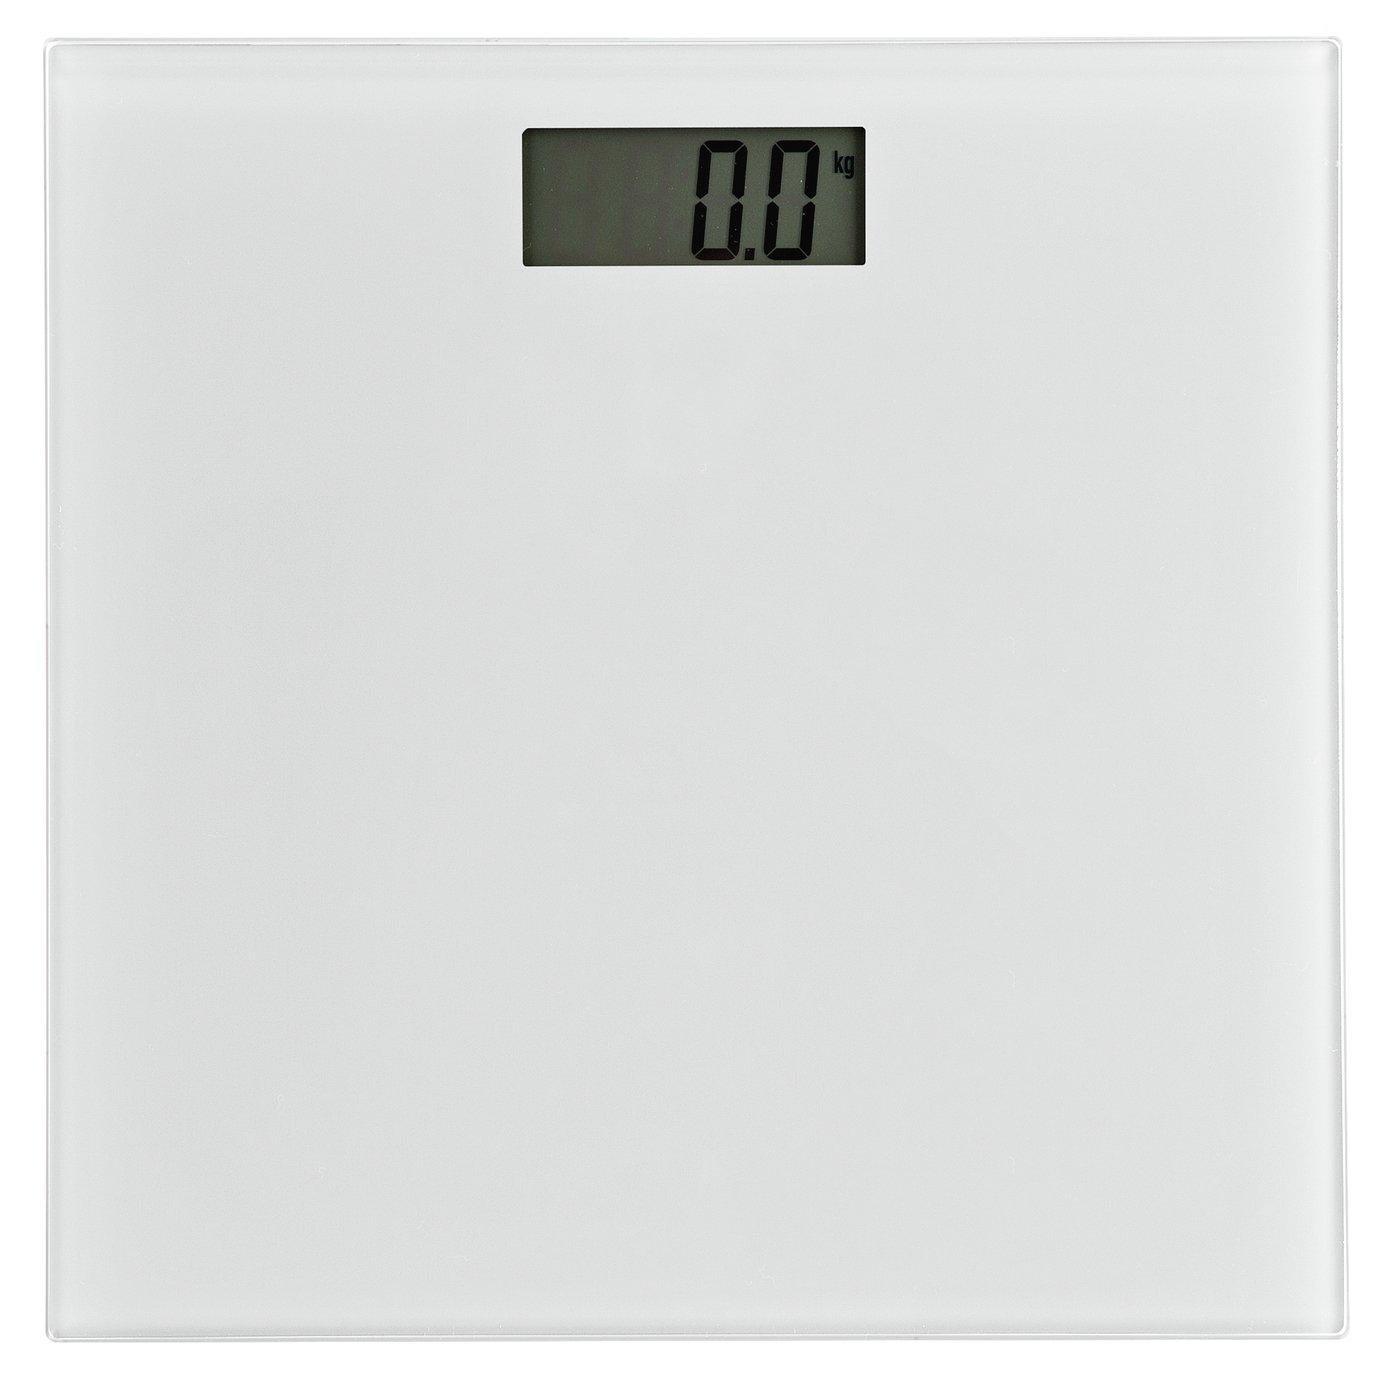 Argos Home Electronic Bathroom Scales - White